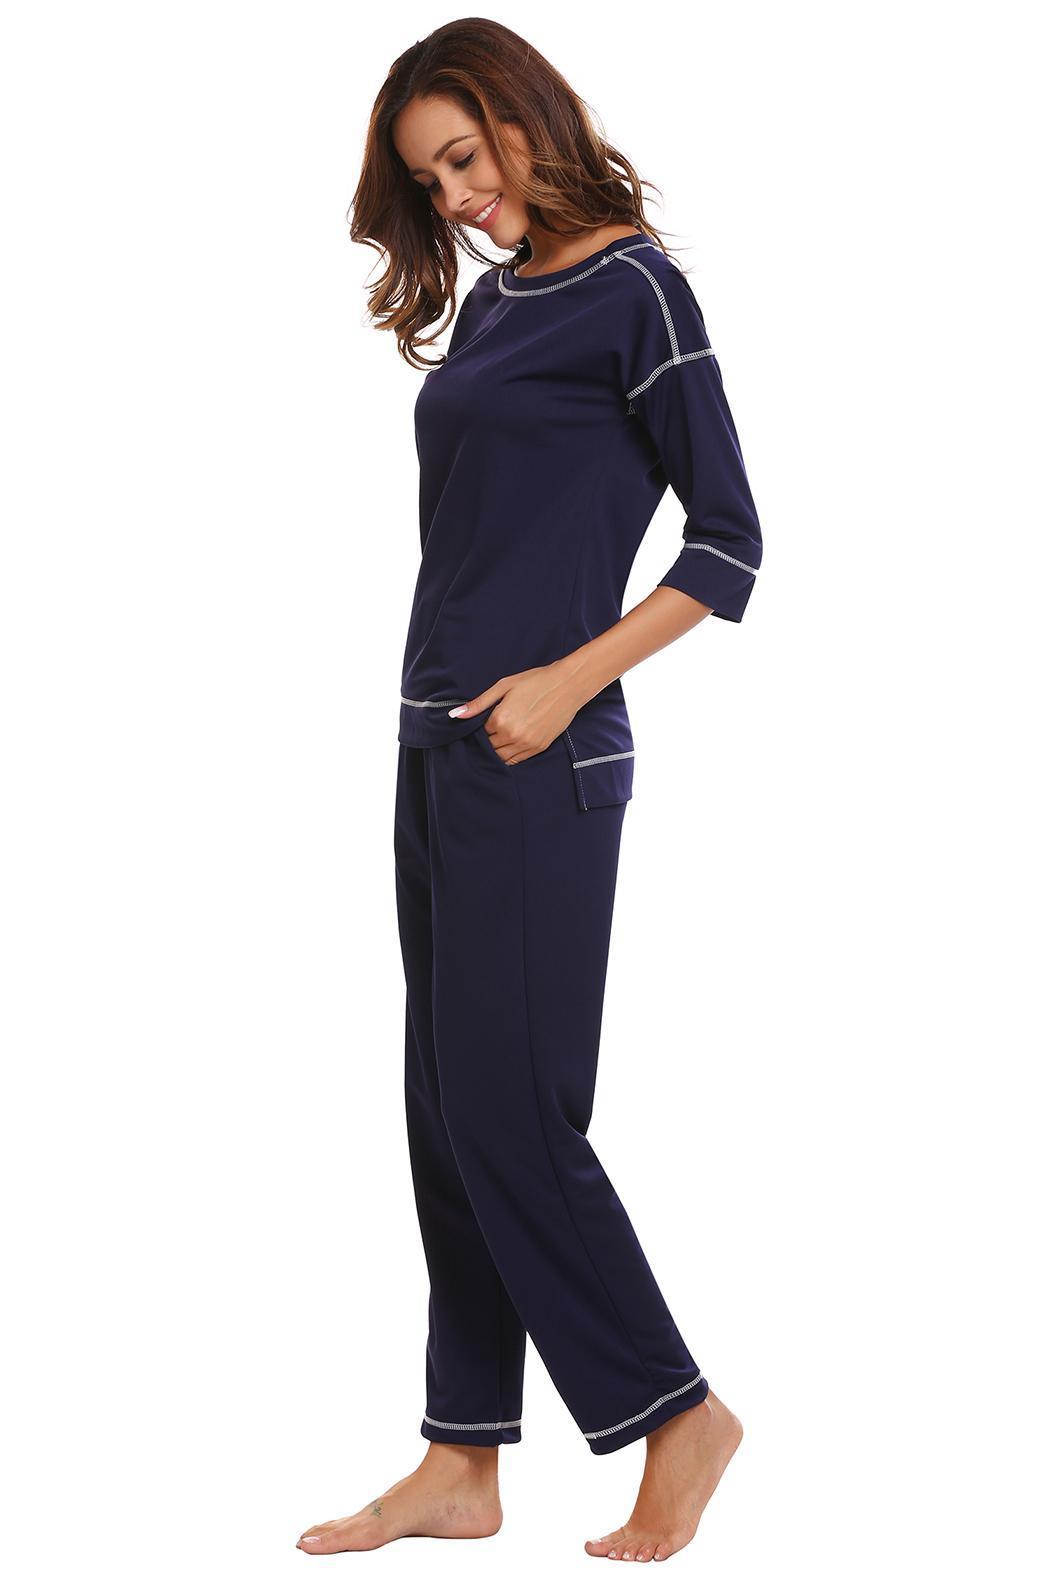 Women Sleepwear 3//4 Sleeve Contrast Color T-Shirt Top Long Pants Pajama EHE8